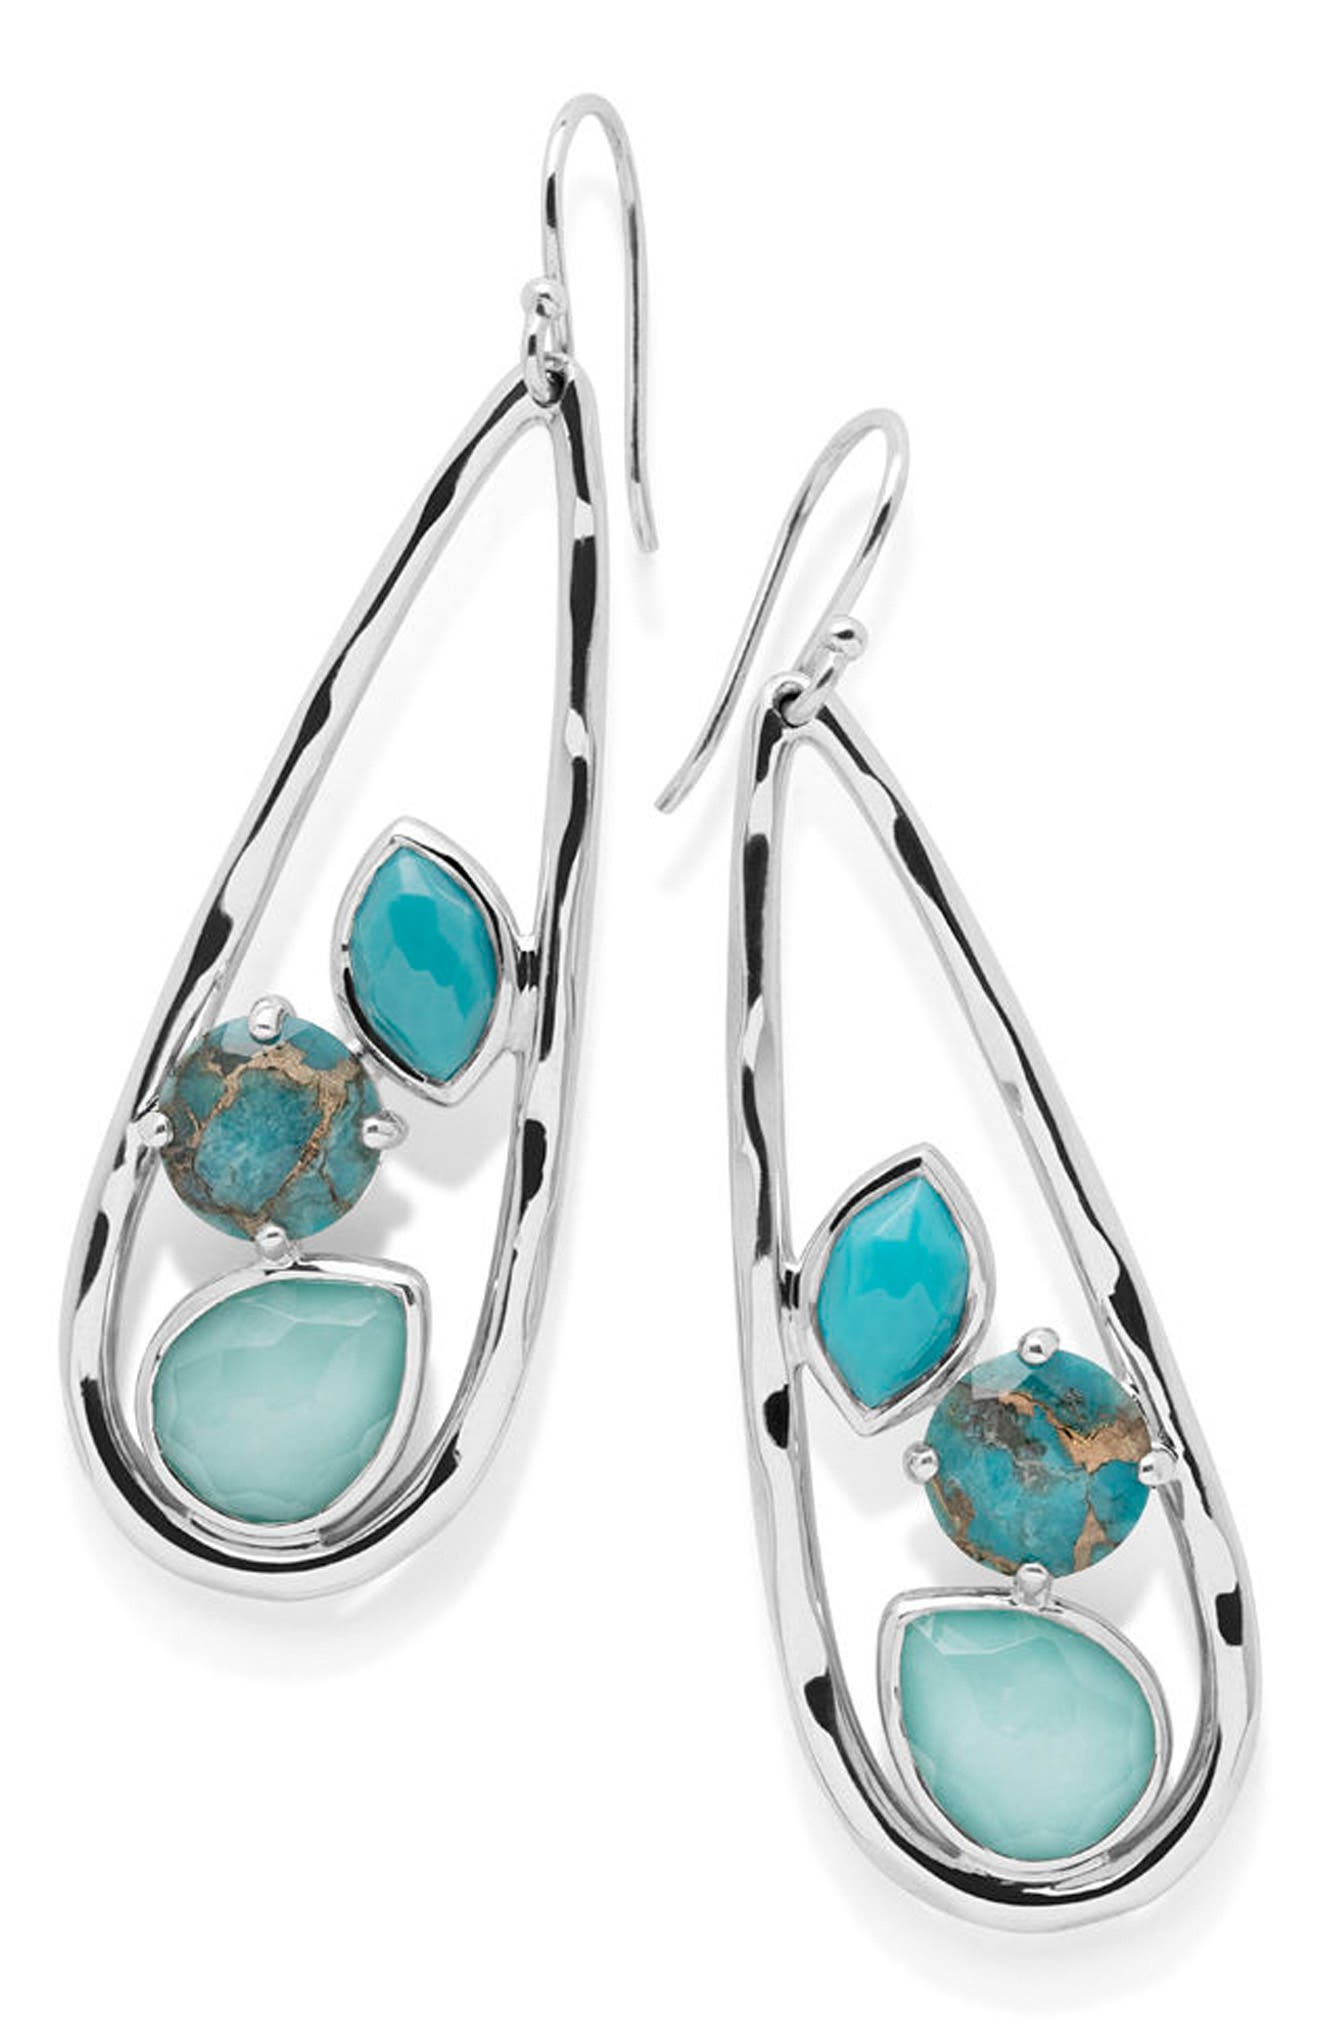 Rock Candy Teardrop Earrings,                             Main thumbnail 1, color,